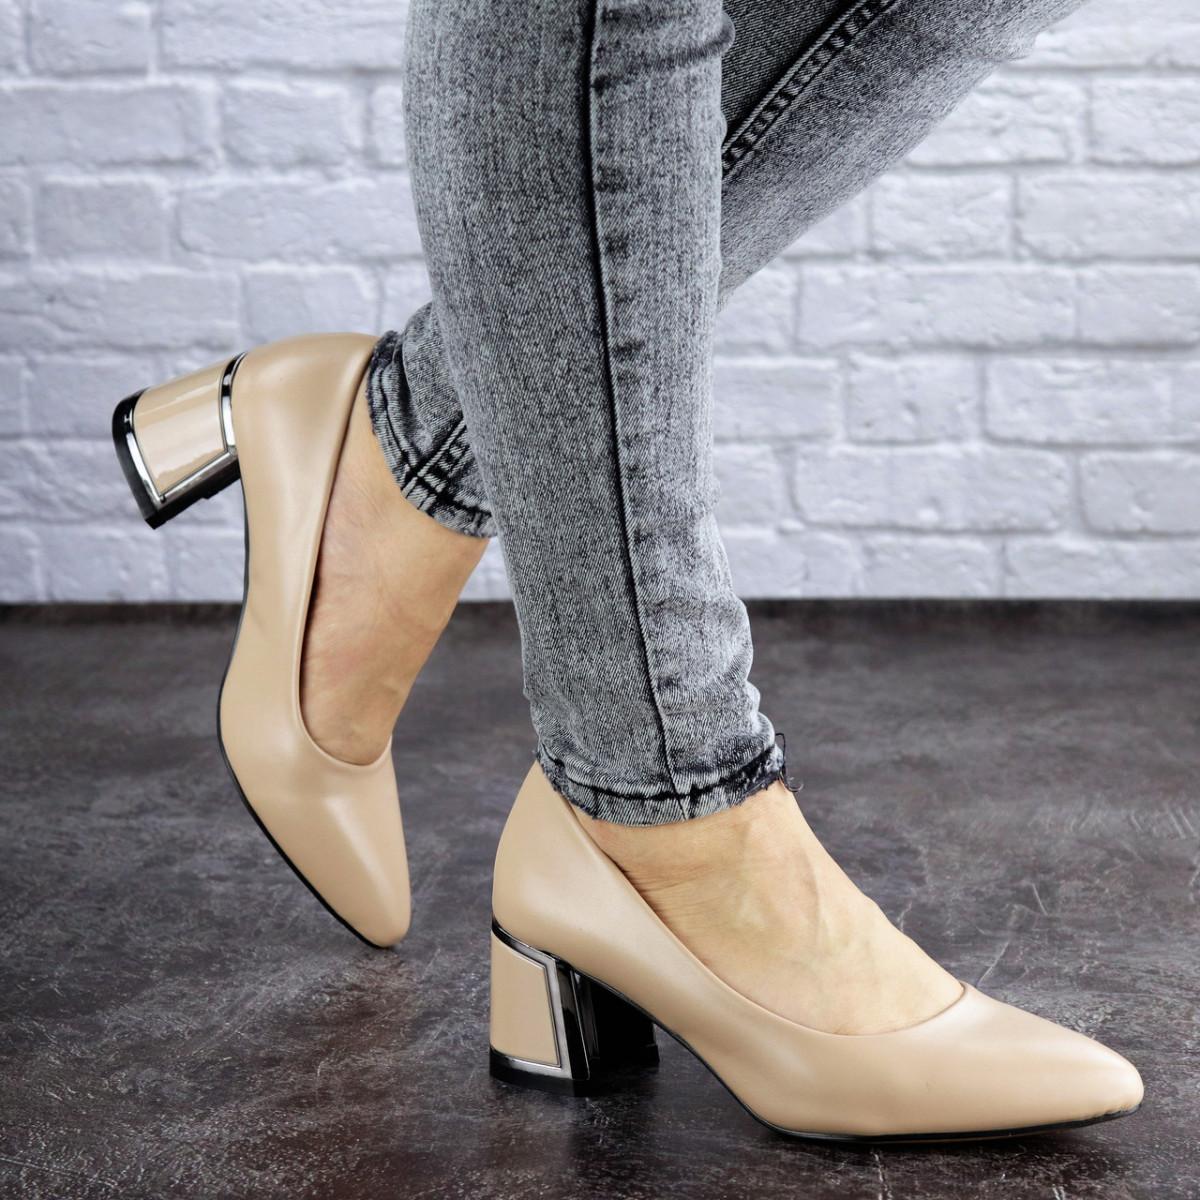 Женские туфли на каблуке Fashion Vinnie 2025 36 размер 23 см Бежевый